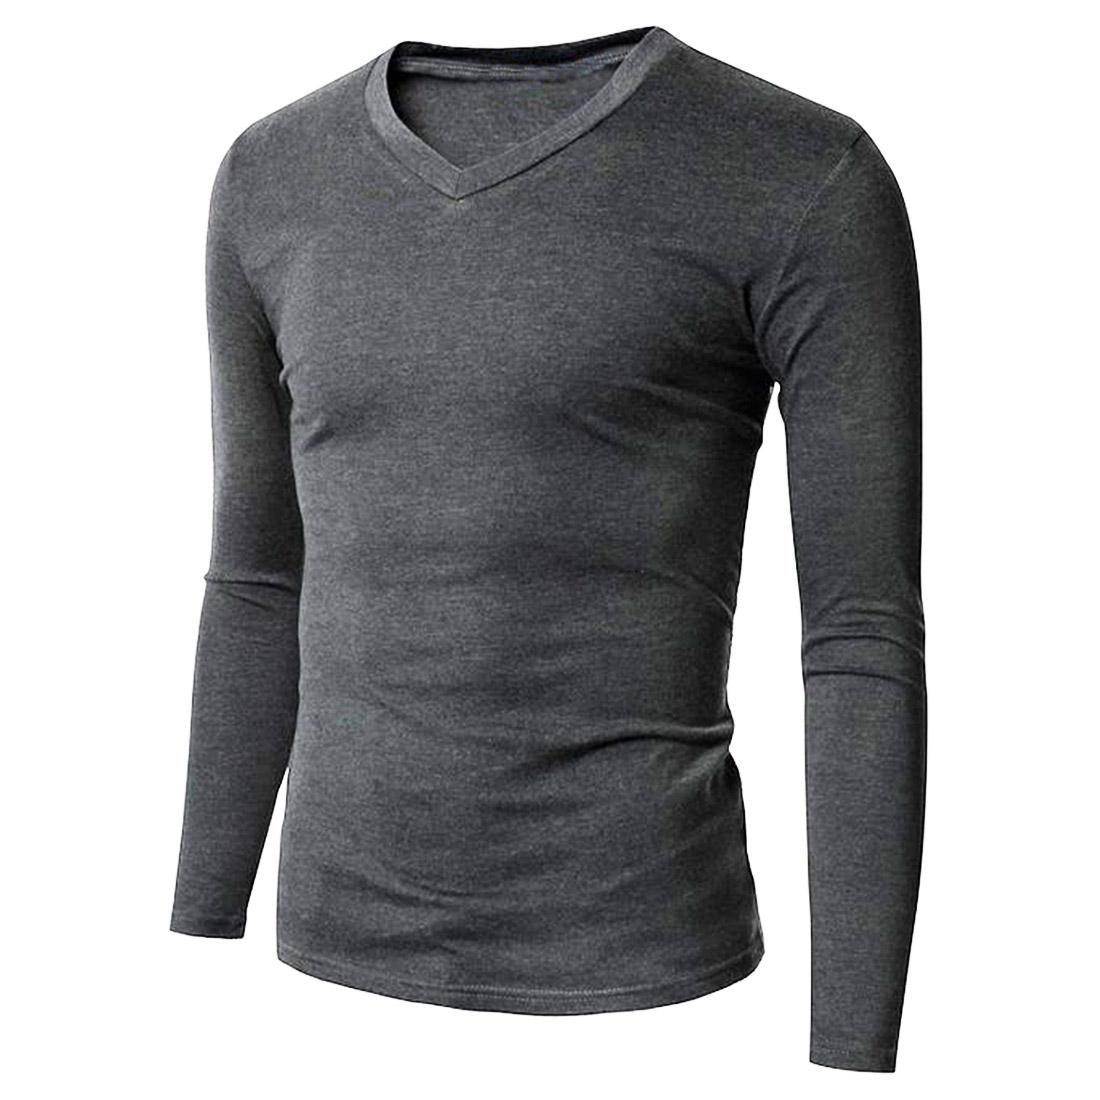 mens cotton basic tee shirts t shirt long sleeve v neck. Black Bedroom Furniture Sets. Home Design Ideas